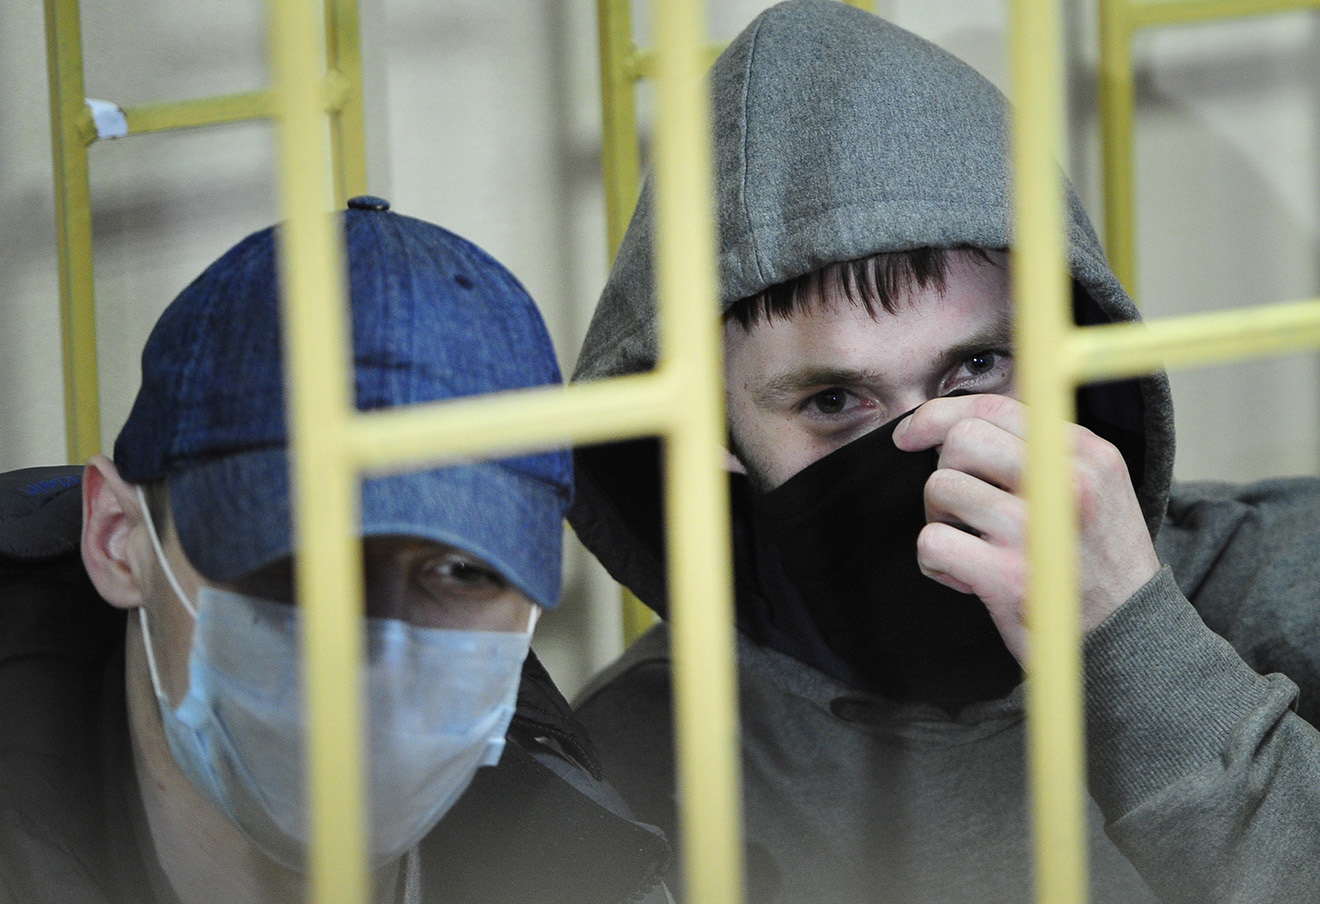 Оглашение вердикта по делу «Приморских партизан». Максим Кириллов и Александр Ковтун (слева направо), 2014 год.